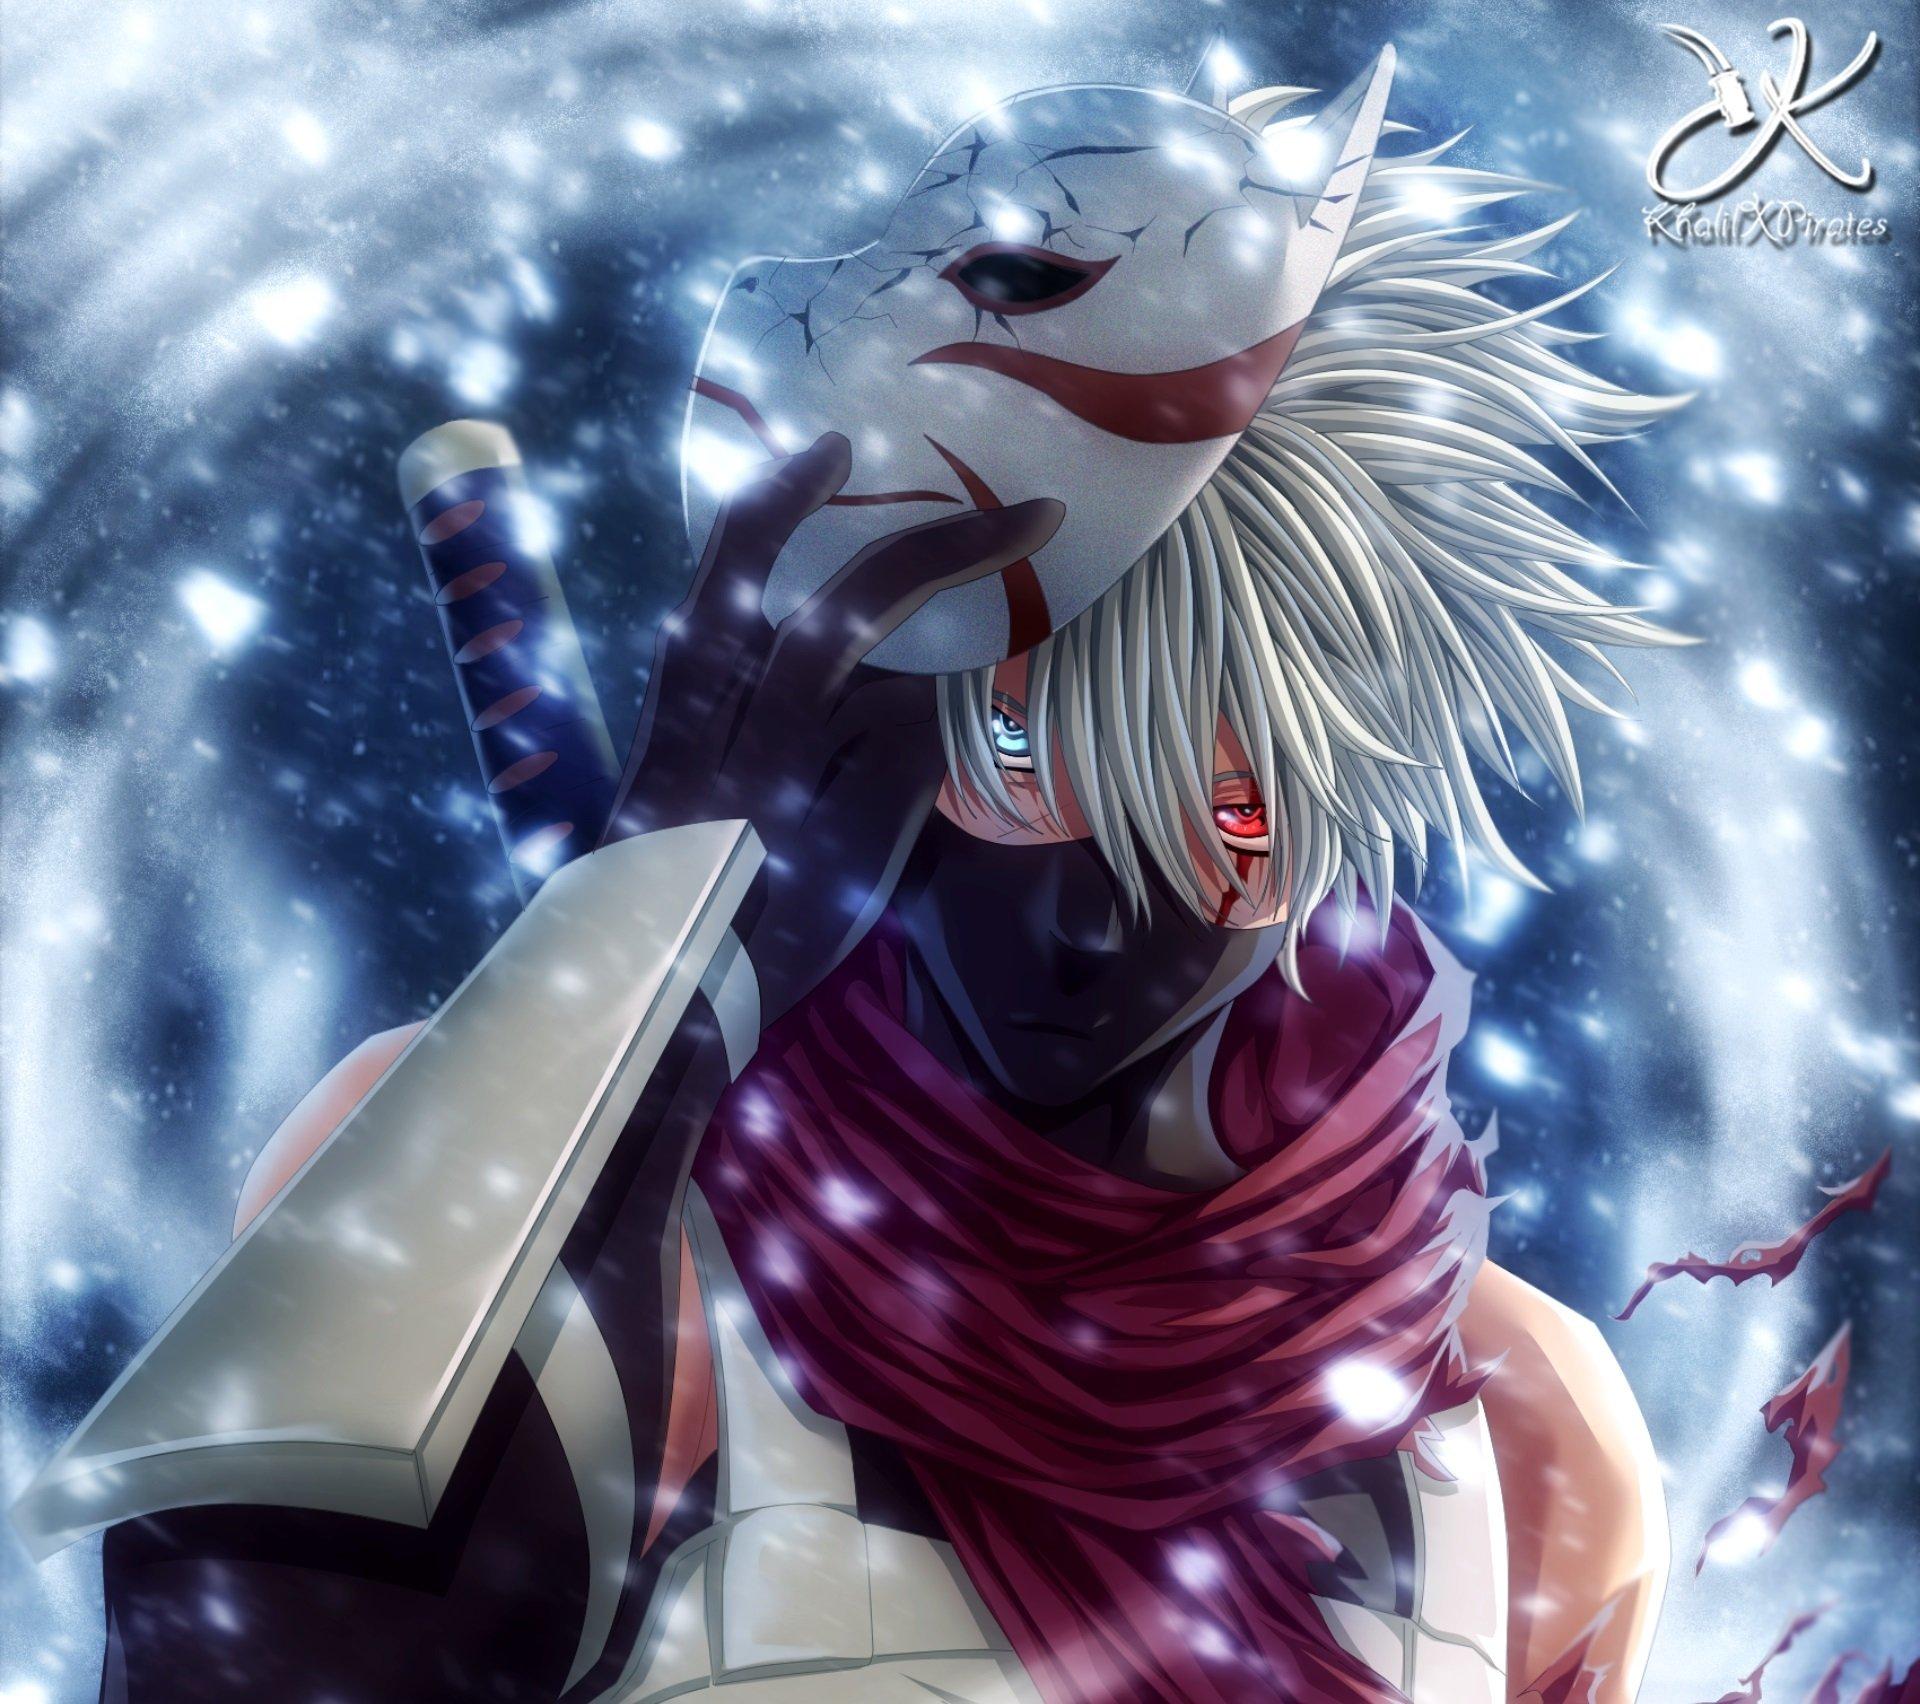 Naruto Fond D Ecran Hd Arriere Plan 1920x1704 Id 1059645 Wallpaper Abyss